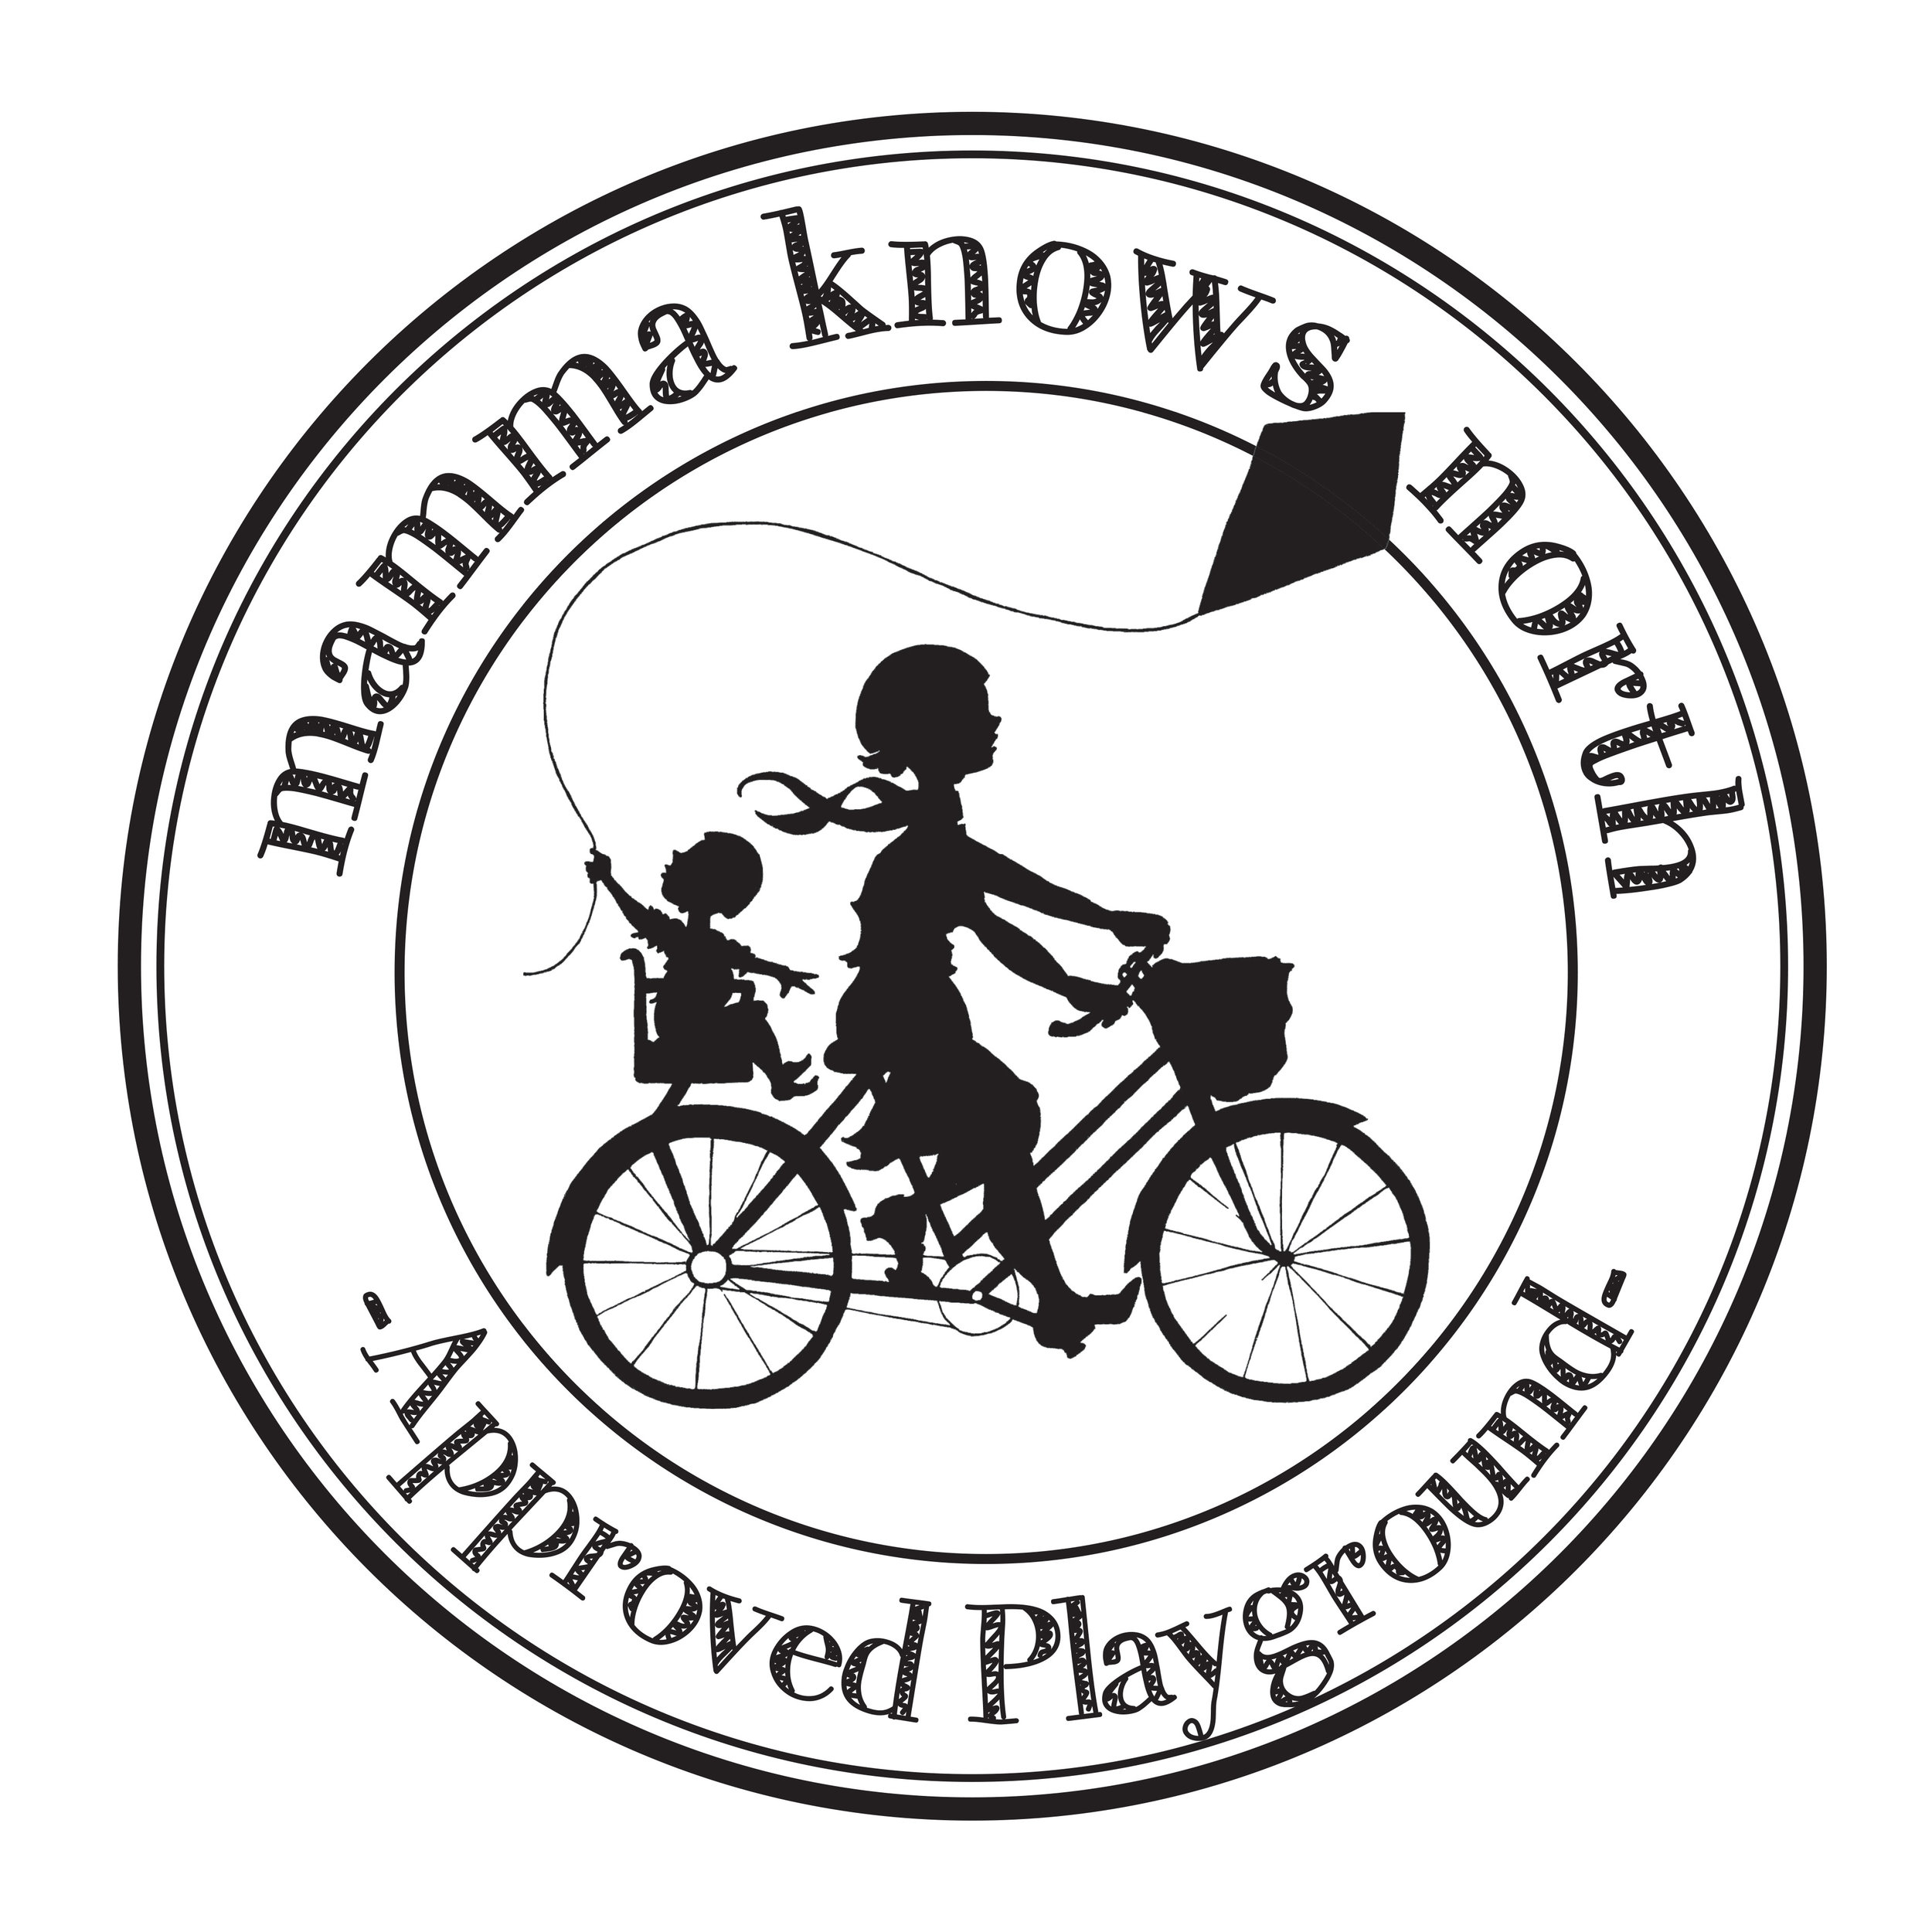 mamma north approved playground.jpg